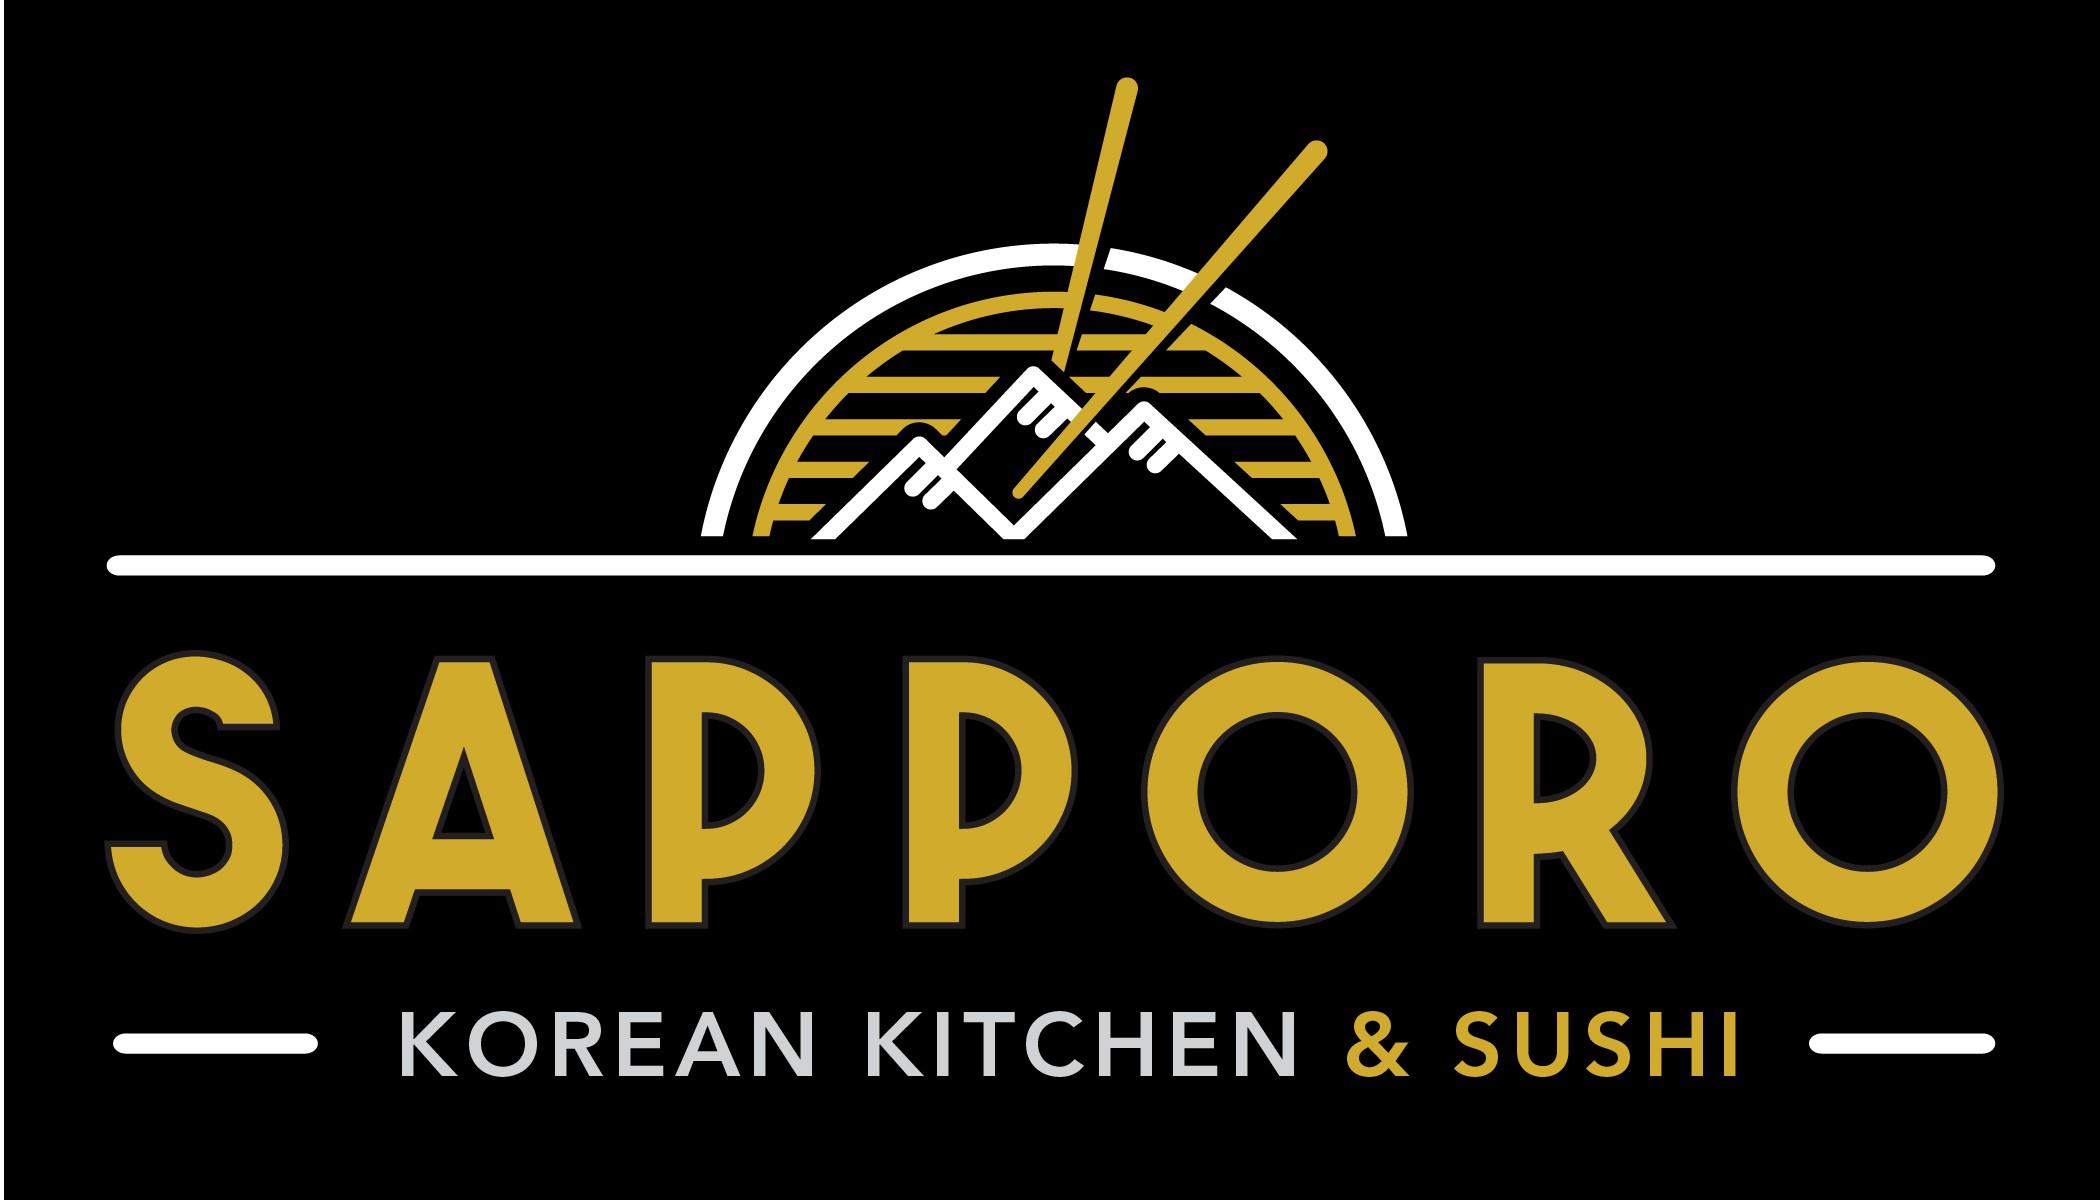 Asian Restaurant needs a modernized logo